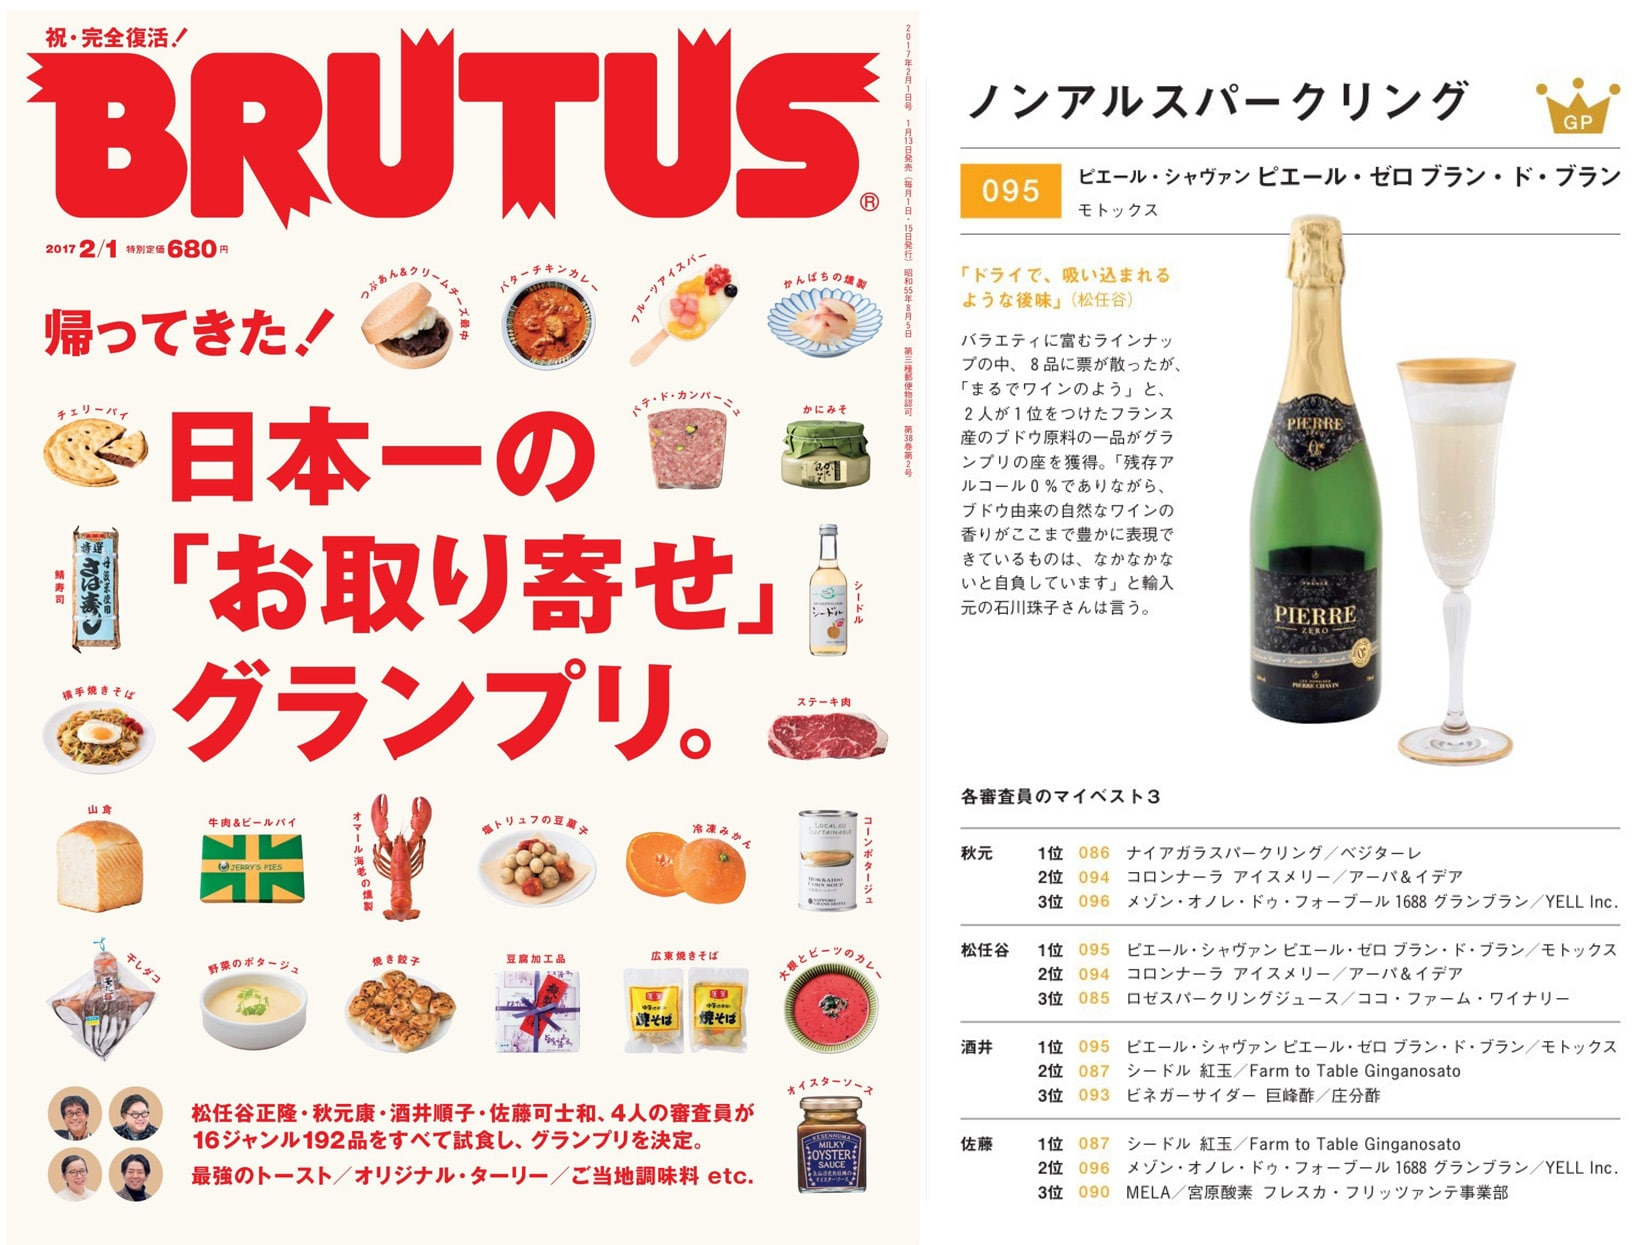 Pierre Zéro rewarded in the japonese magazine BRUTUS